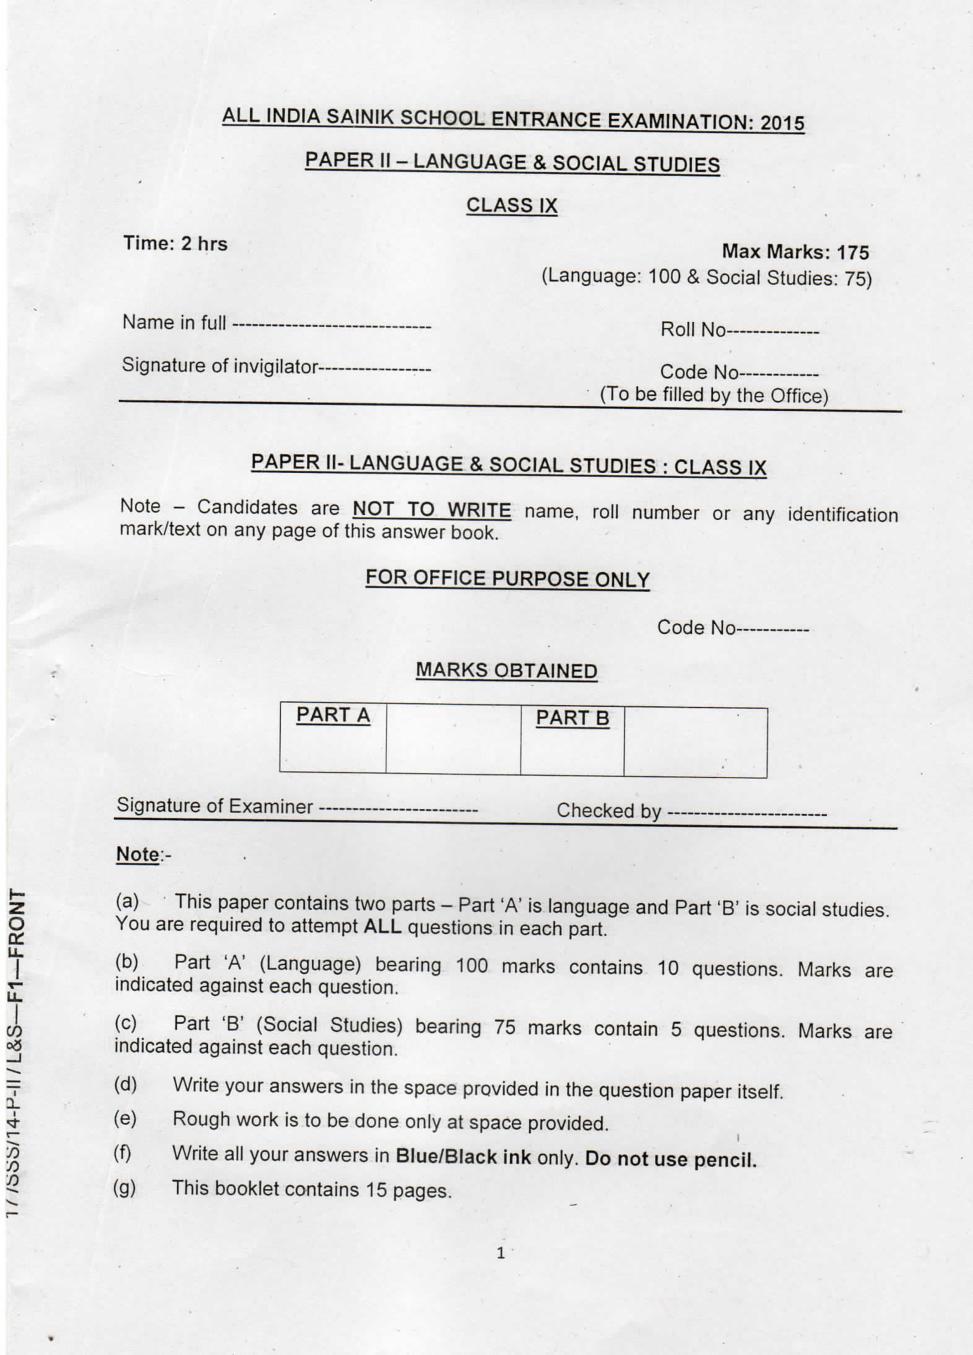 AISSEE 2015 Question Paper for Class 9 | Sainik School Entrance Exam (Paper 2) - Page 1